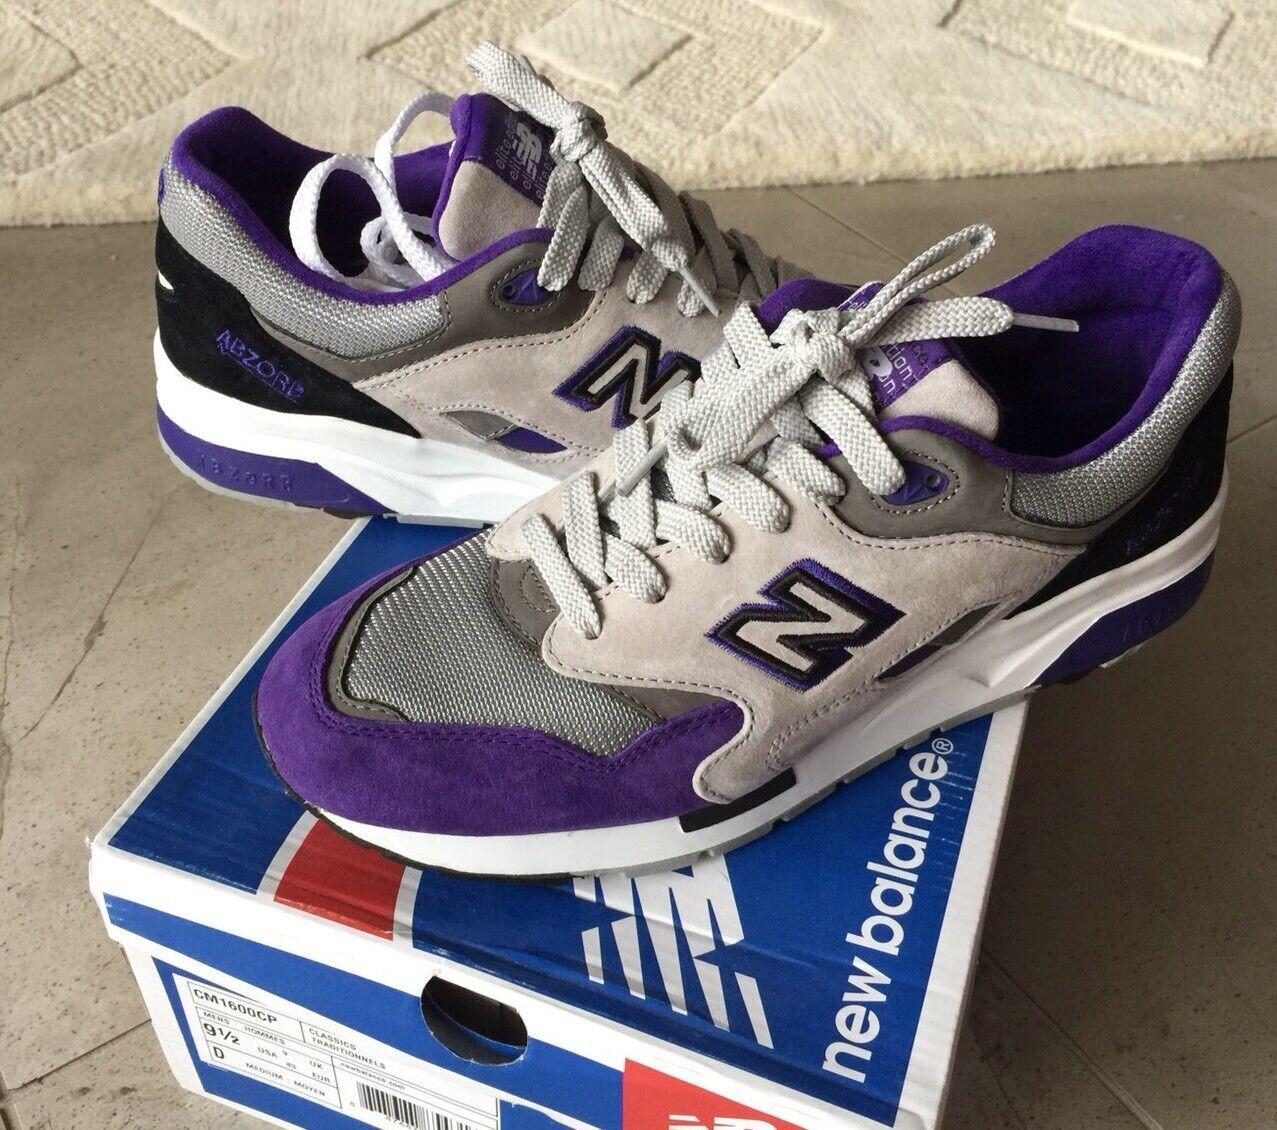 Limited New Balance 1600 CM1600CP 9.5 990 Purple Grey White 991 993 992